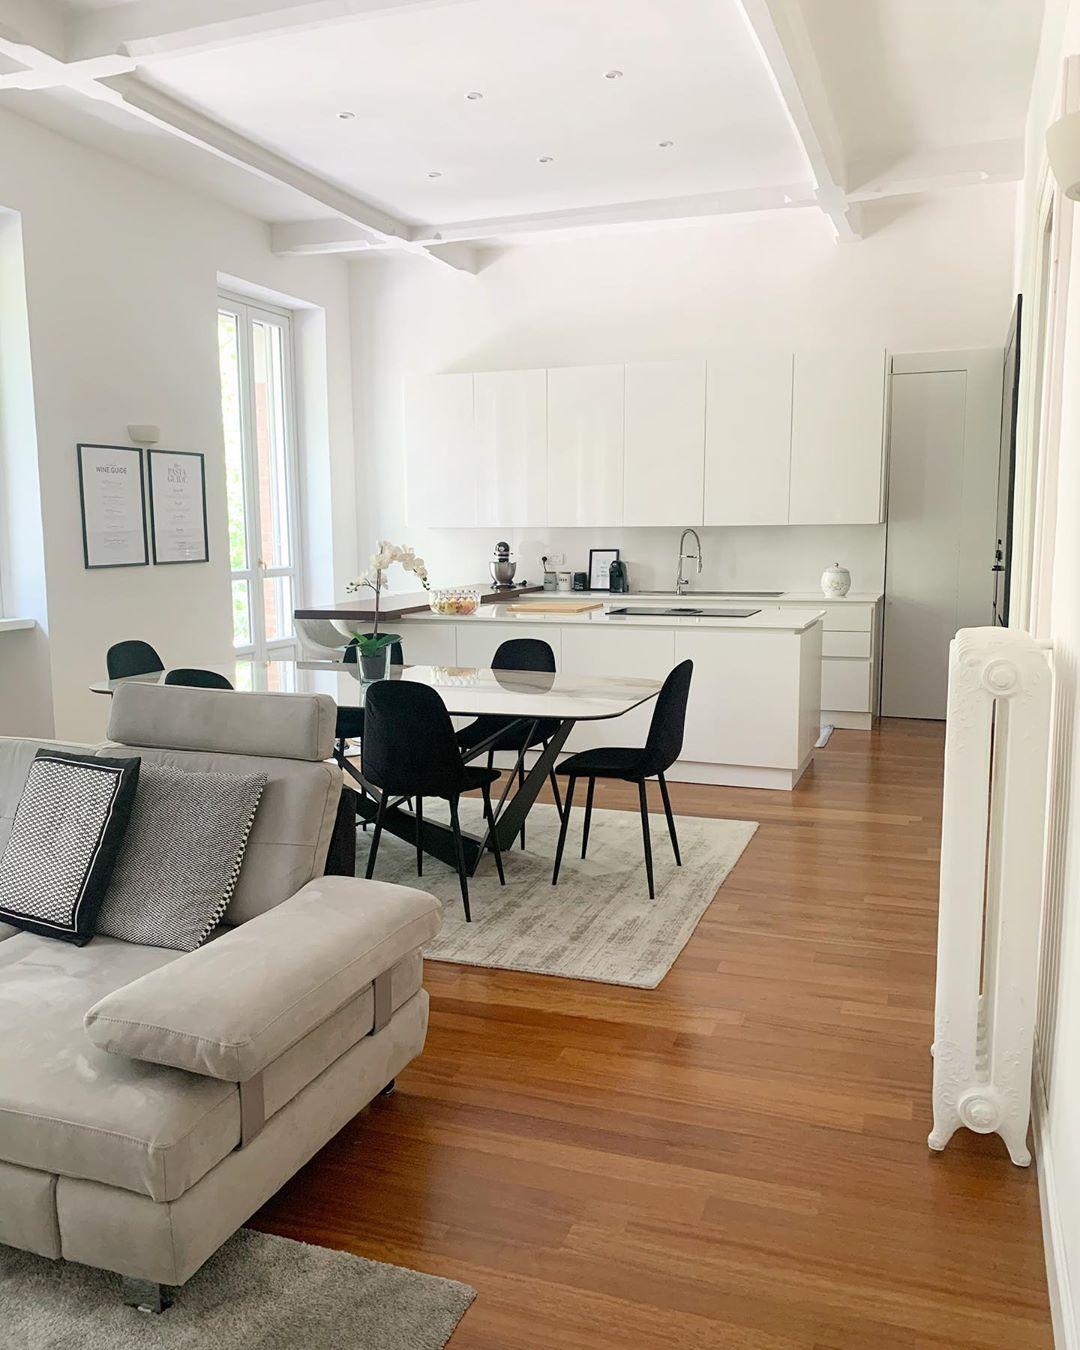 casa barieri living openspace